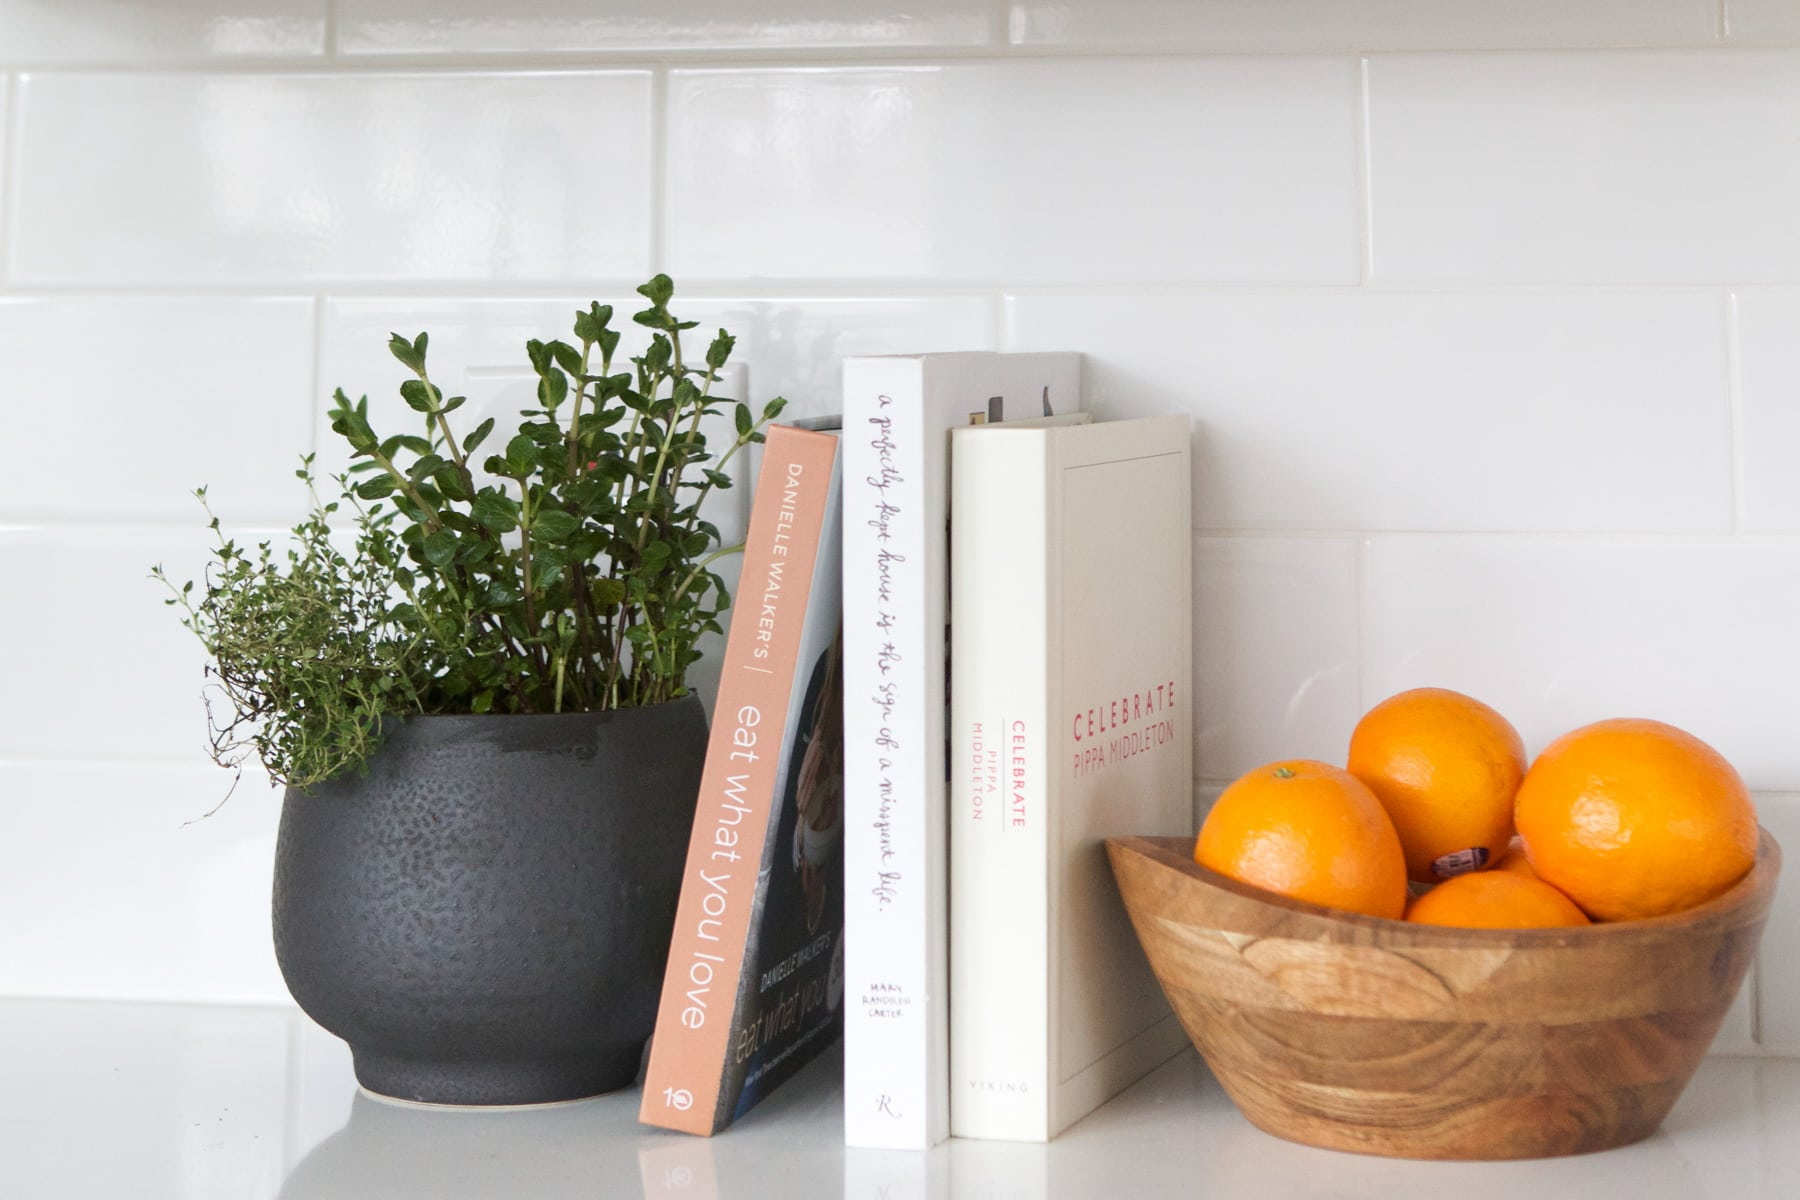 pot with plants